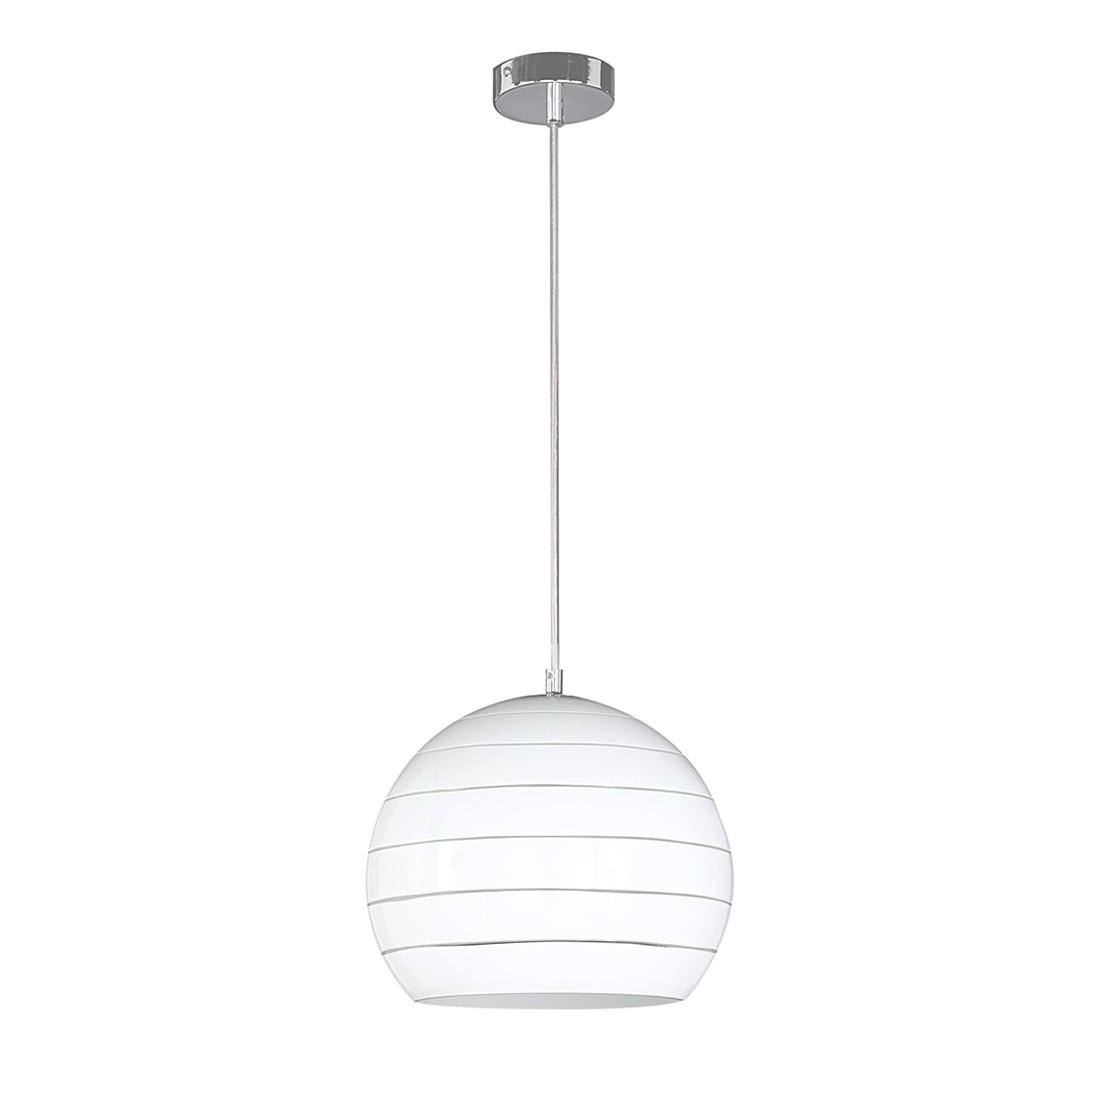 energie  A++, Hanglamp Zoon - 1 lichtbron, Wofi